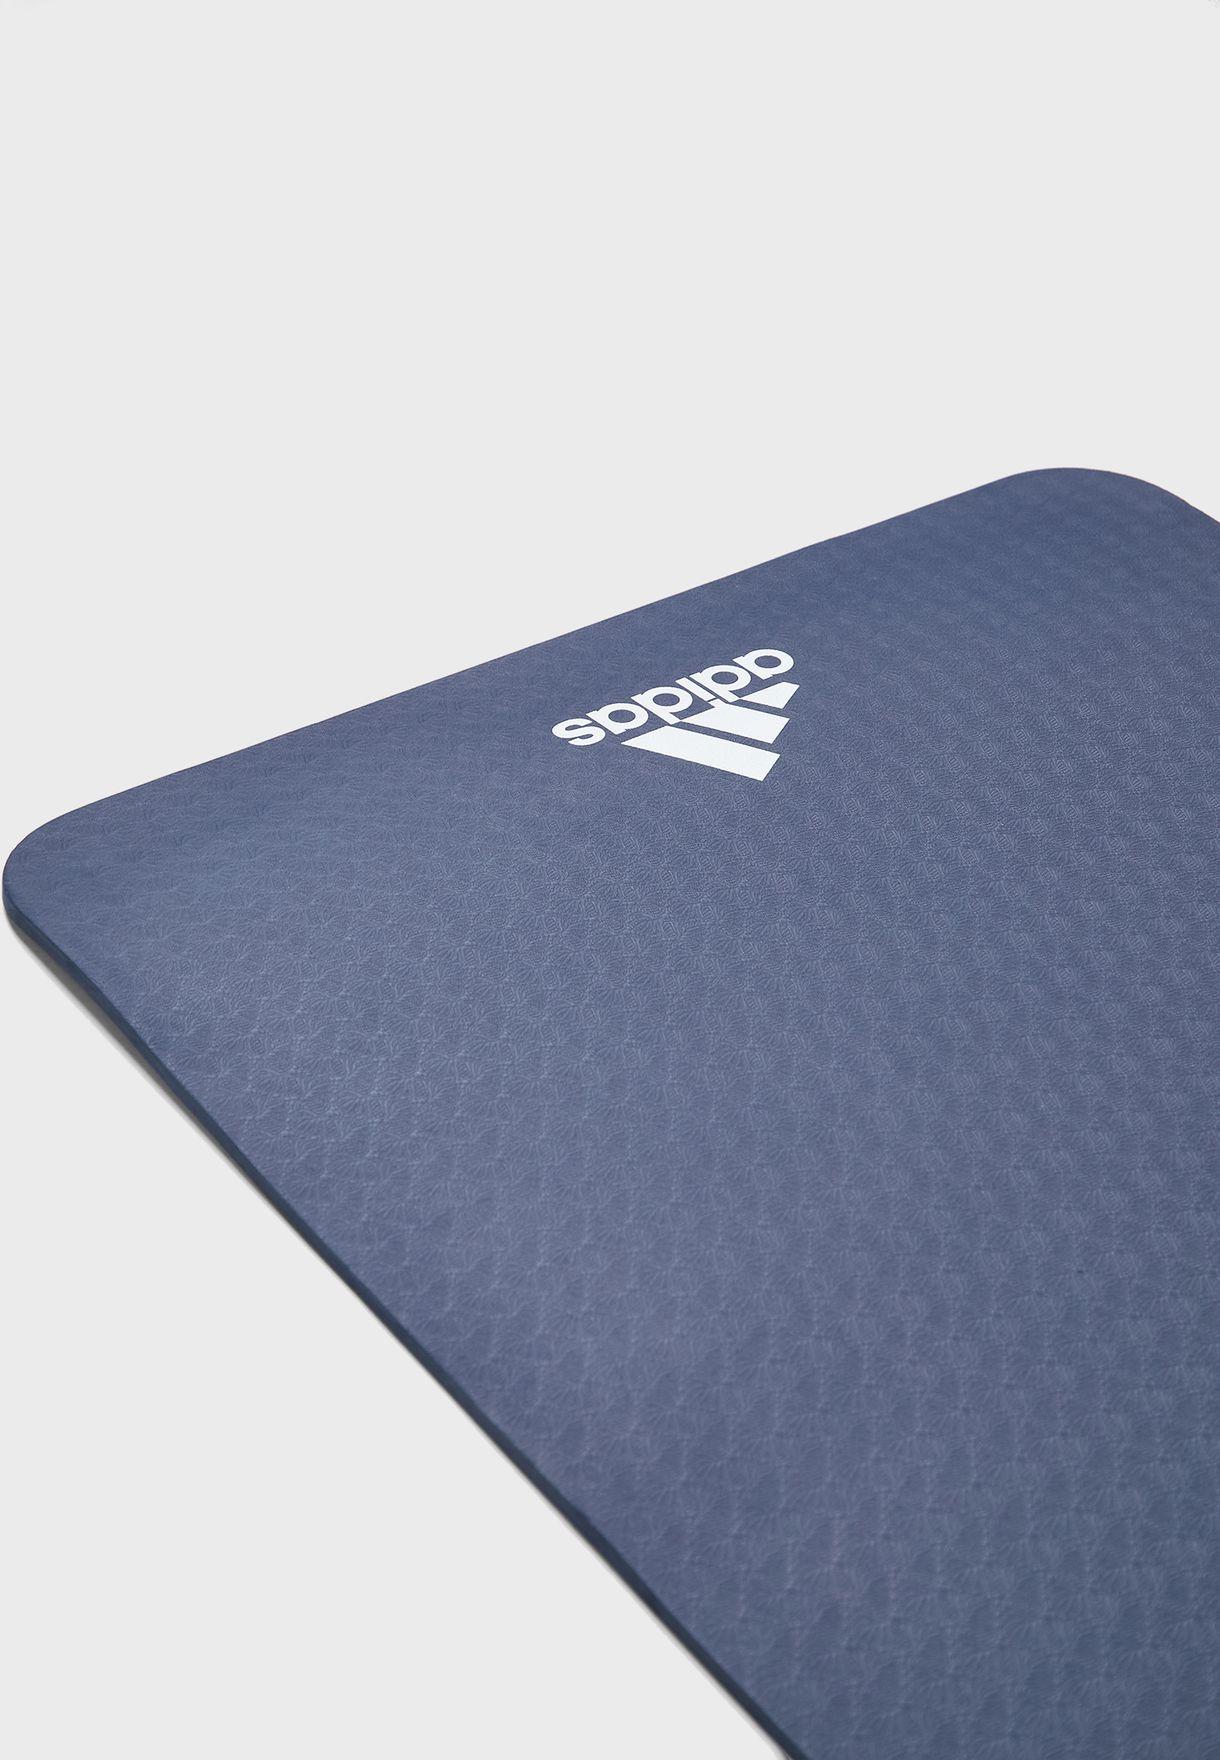 Buy Adidas Blue Yoga Mat 8mm For Women In Mena Worldwide Globally 14448ac20qbp